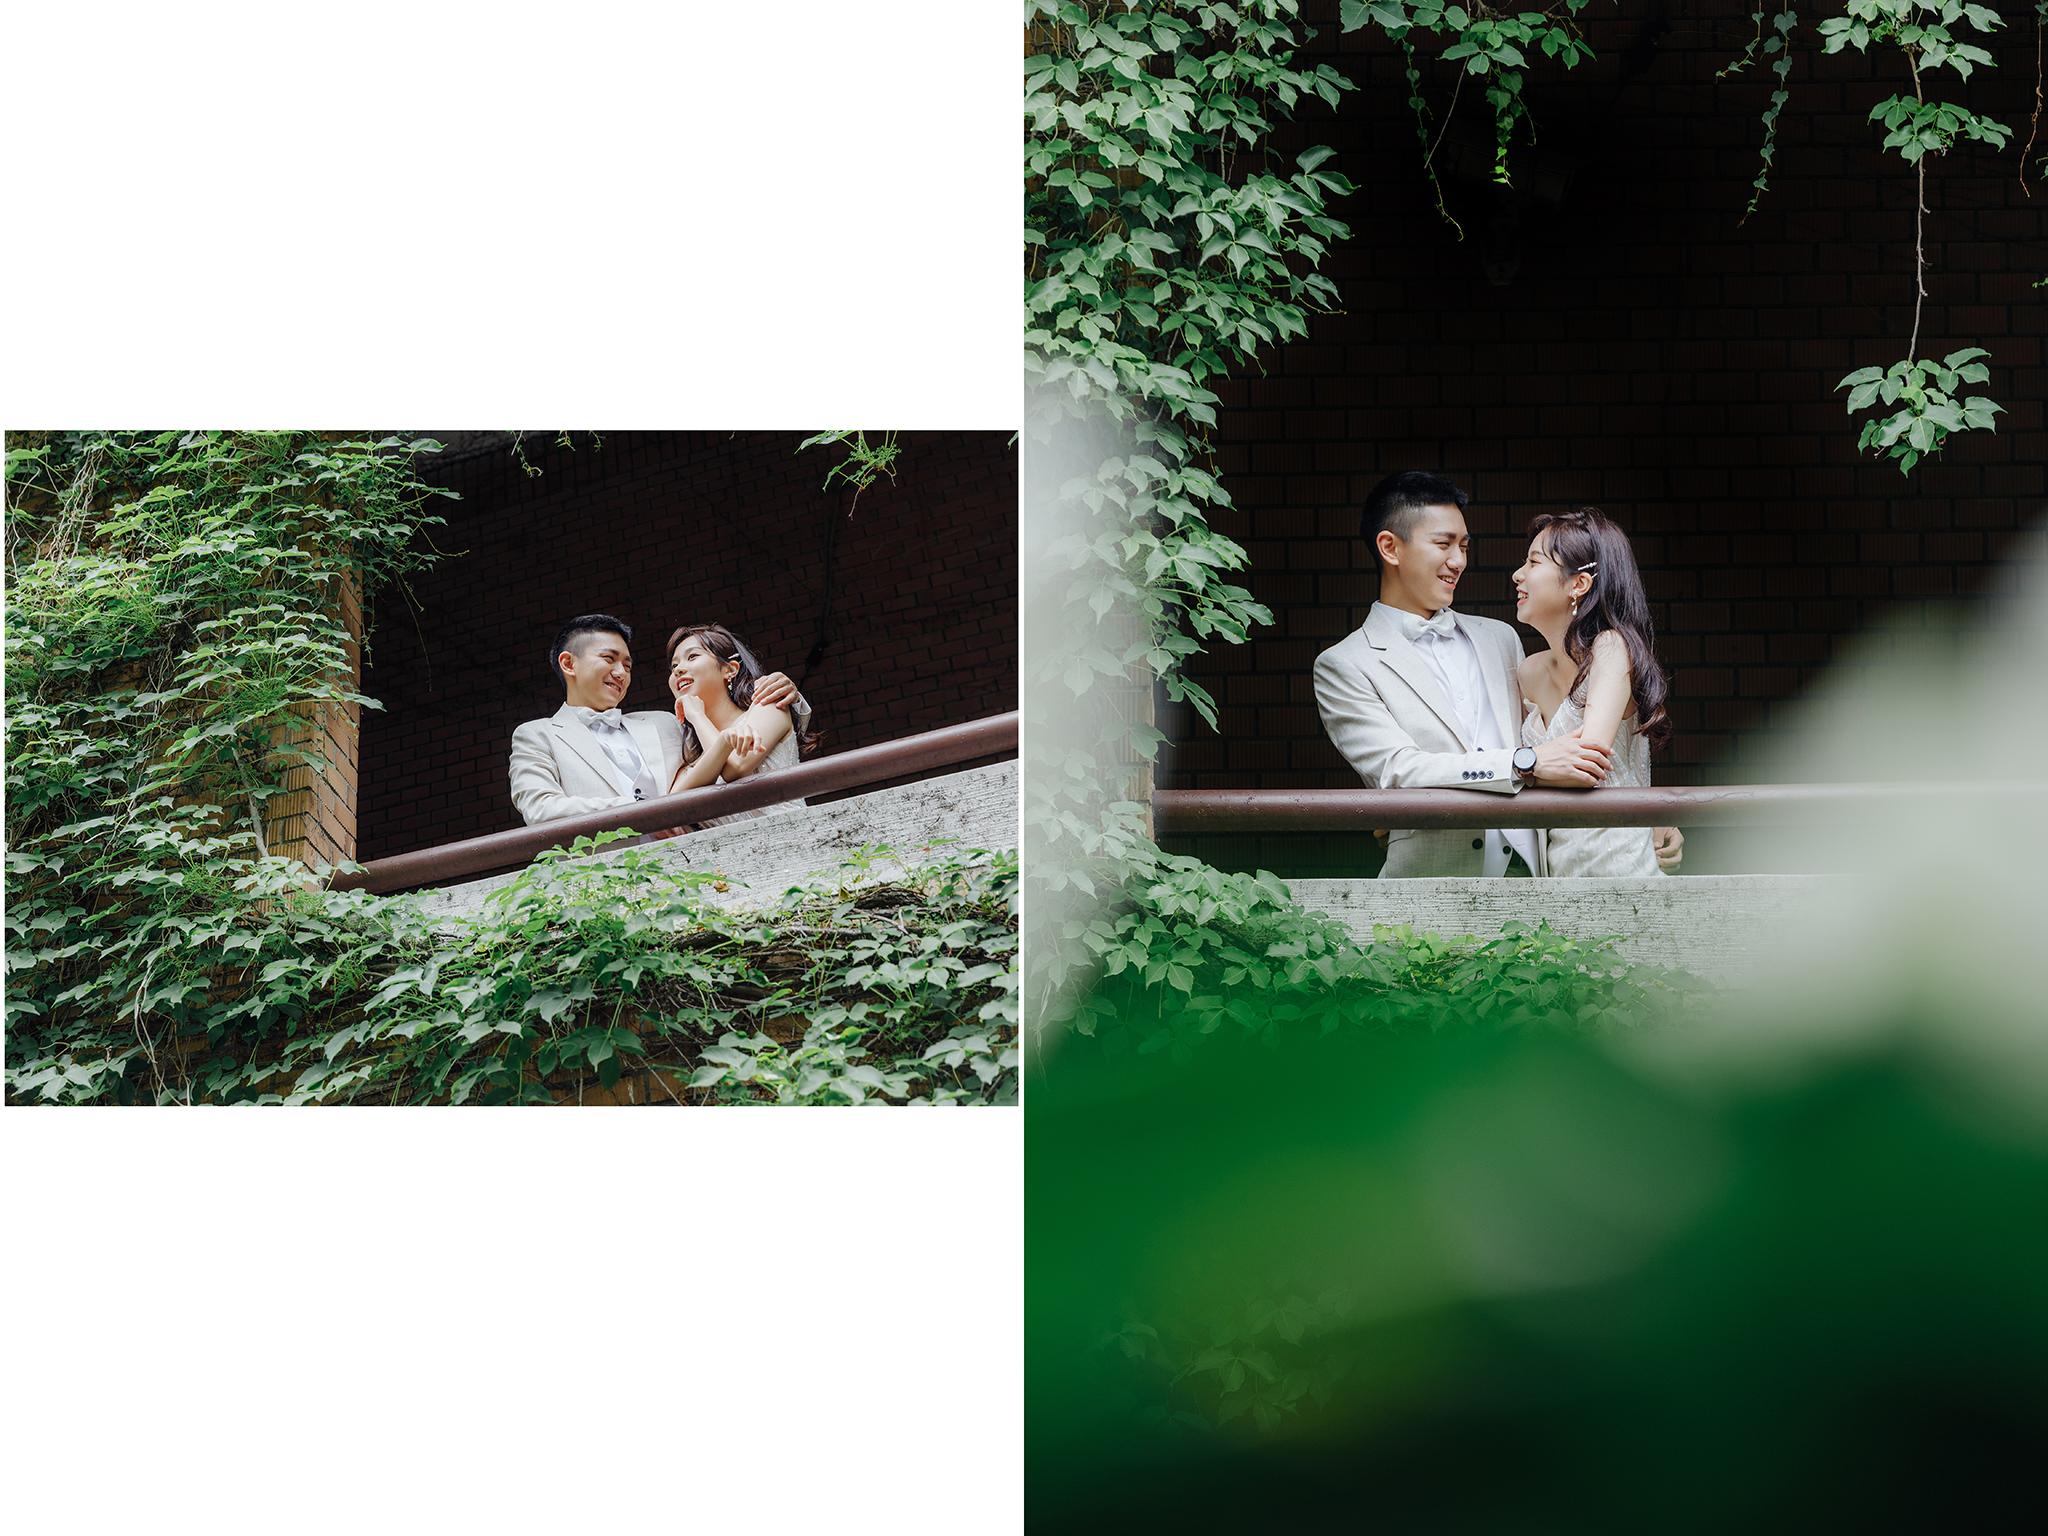 47985581608 0443205c95 o - 【自主婚紗】+Jared & Arina+